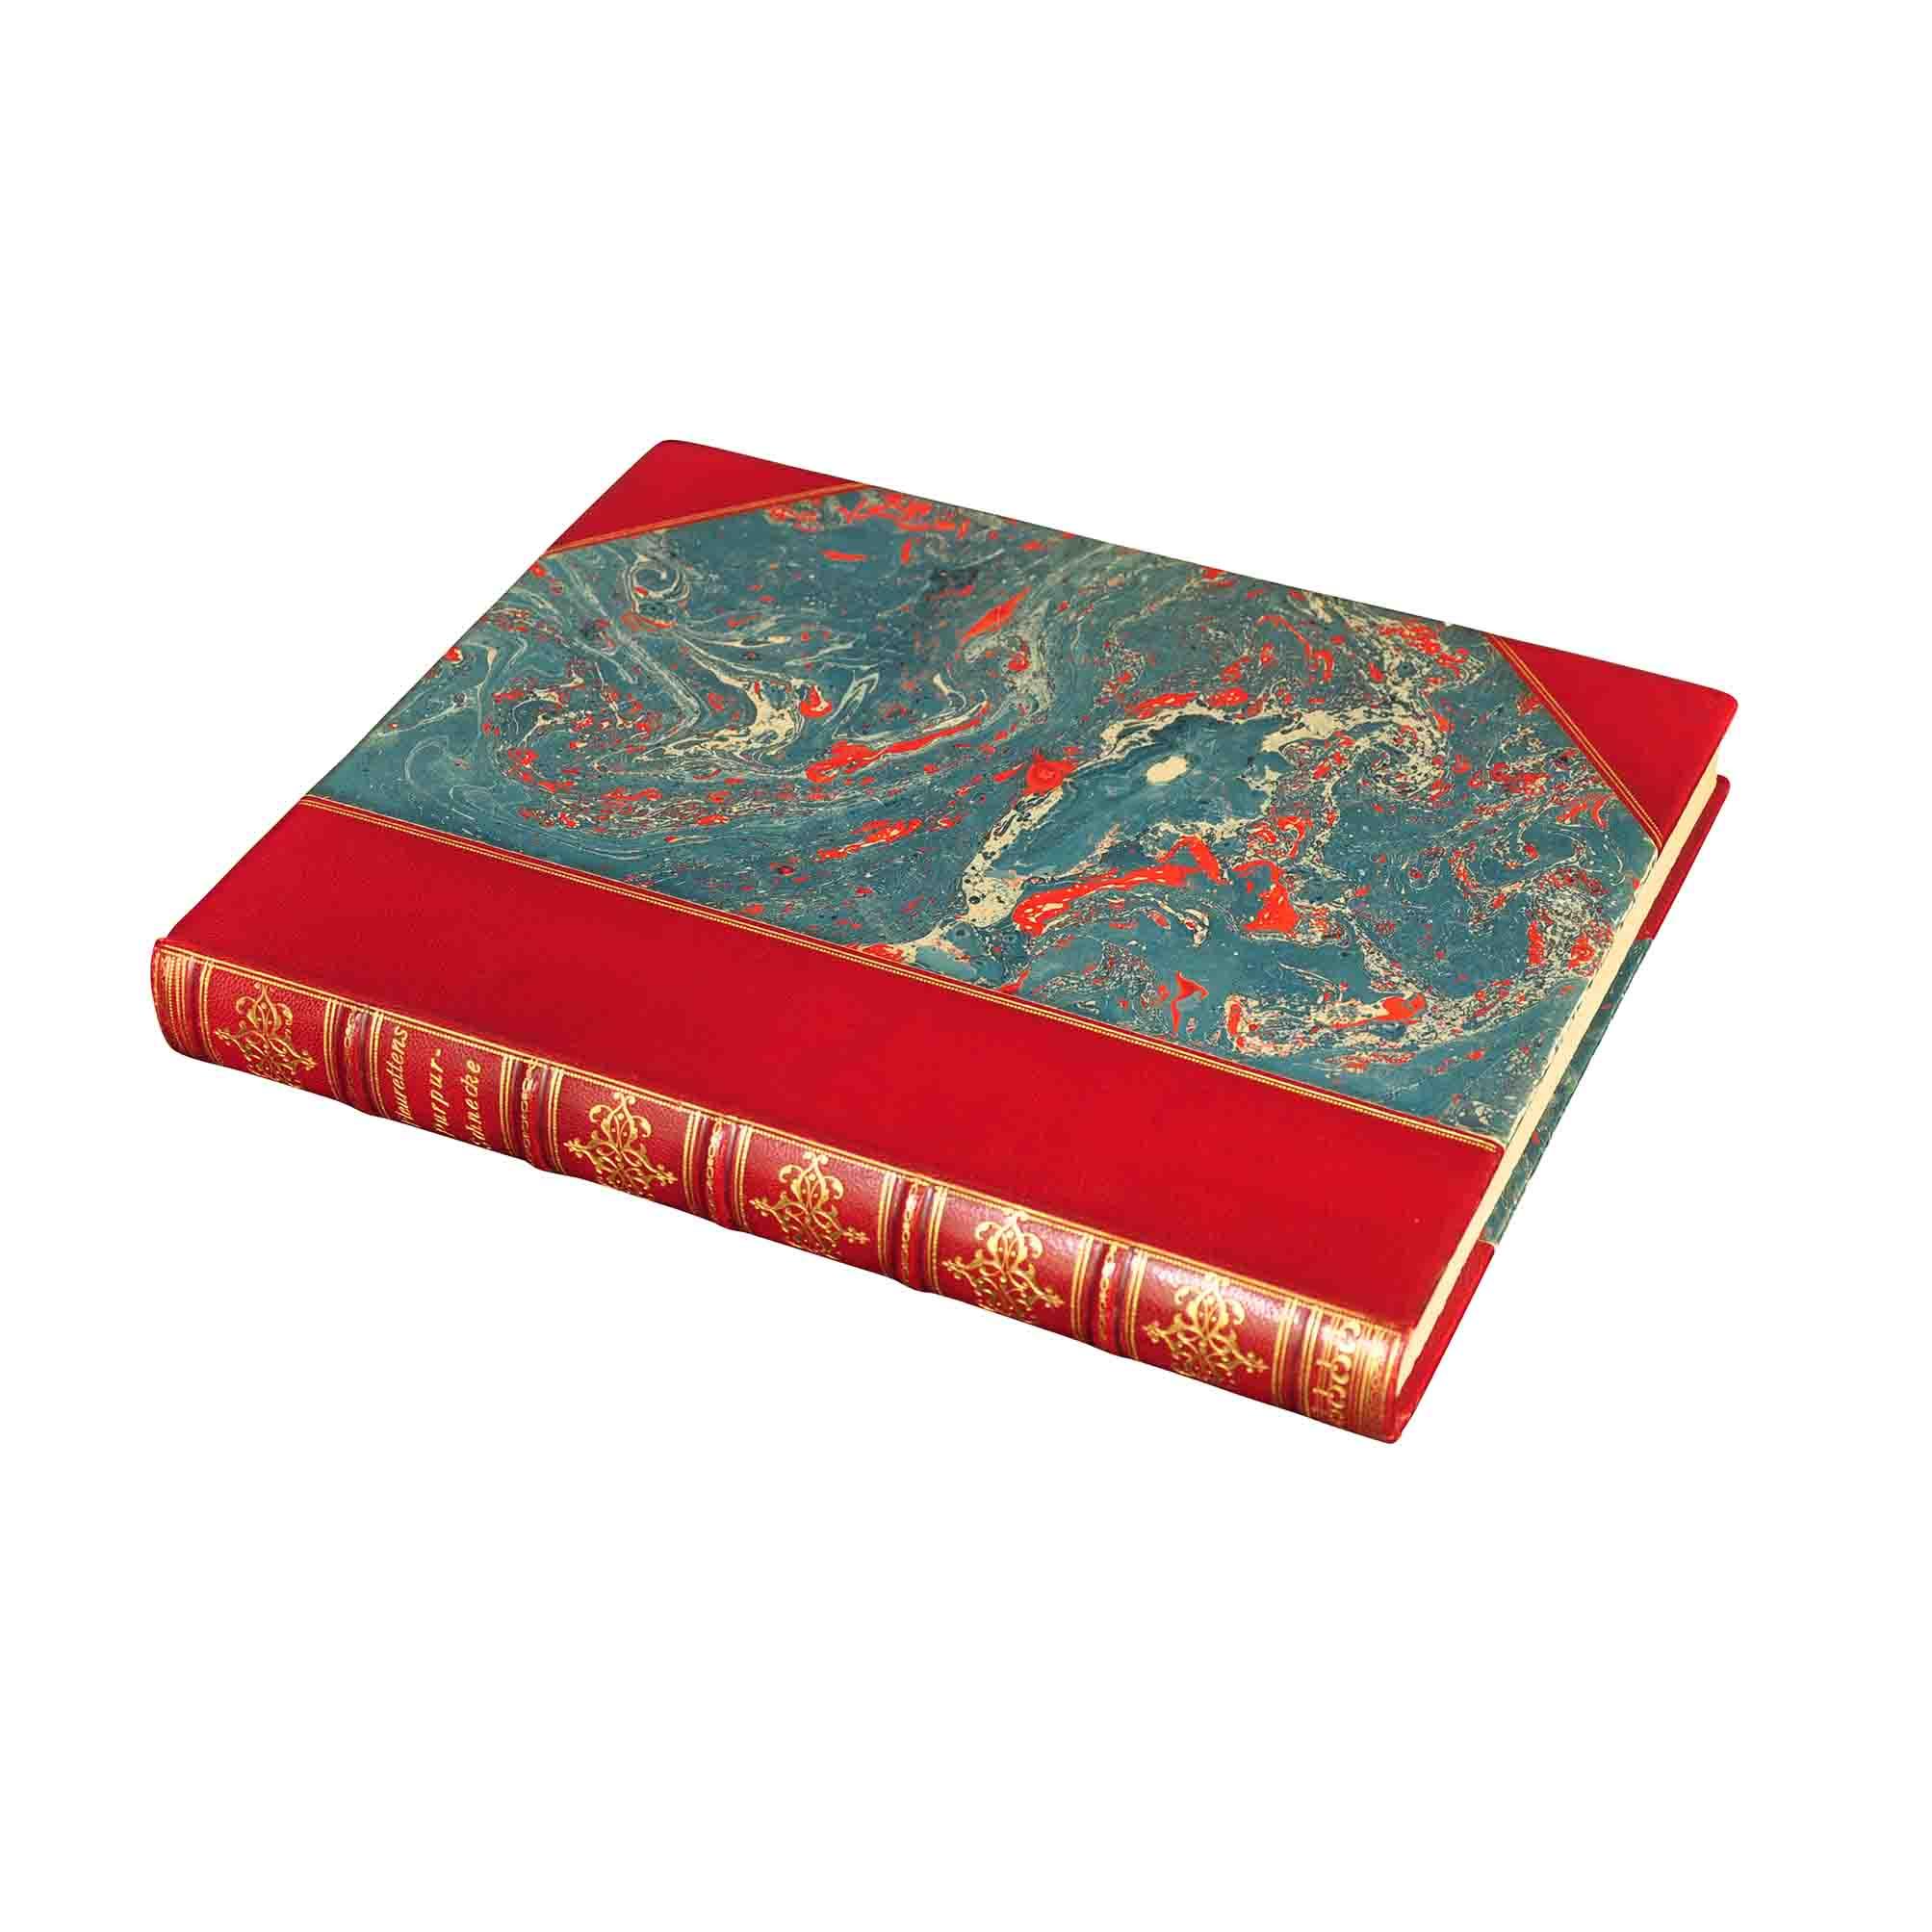 5698-Bayros-Purpurschnecke-1905-Cover-N.jpg